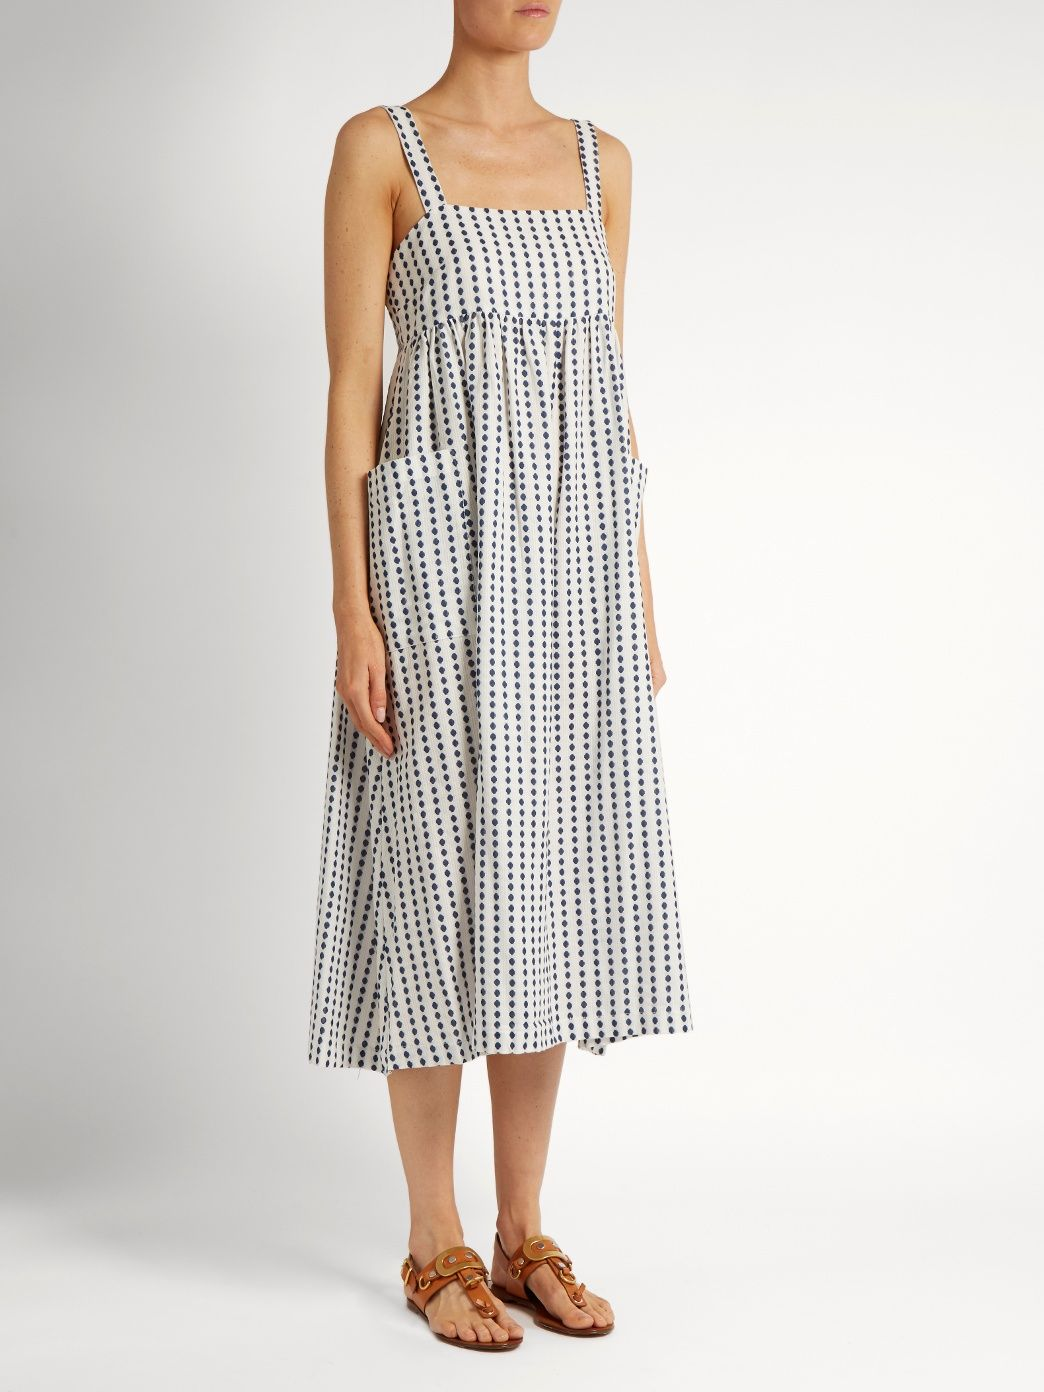 Polka-dot cotton midi dress | Mara Hoffman | MATCHESFASHION.COM